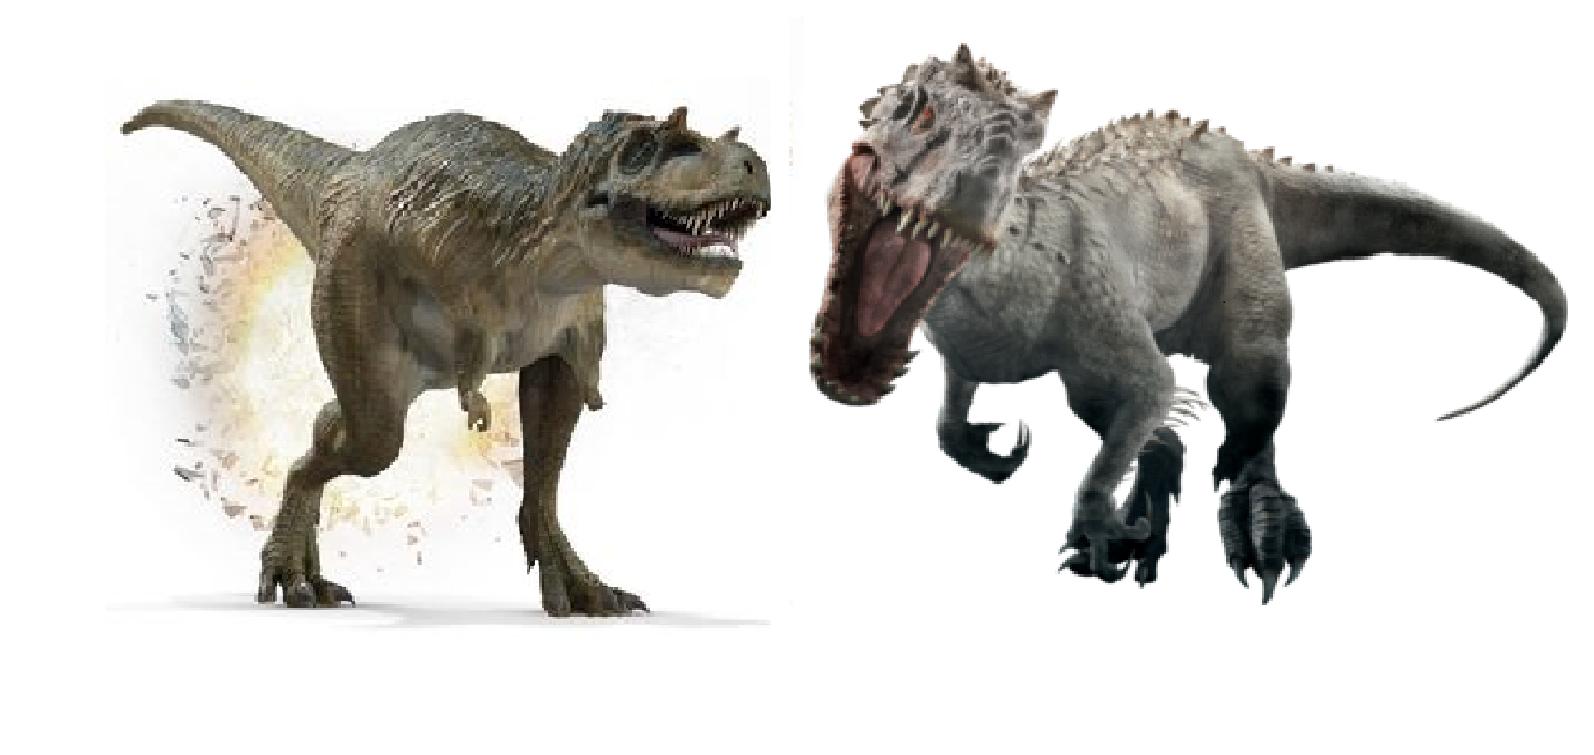 Primeval New World Albertosaurus User blog:Spinosaurus7...